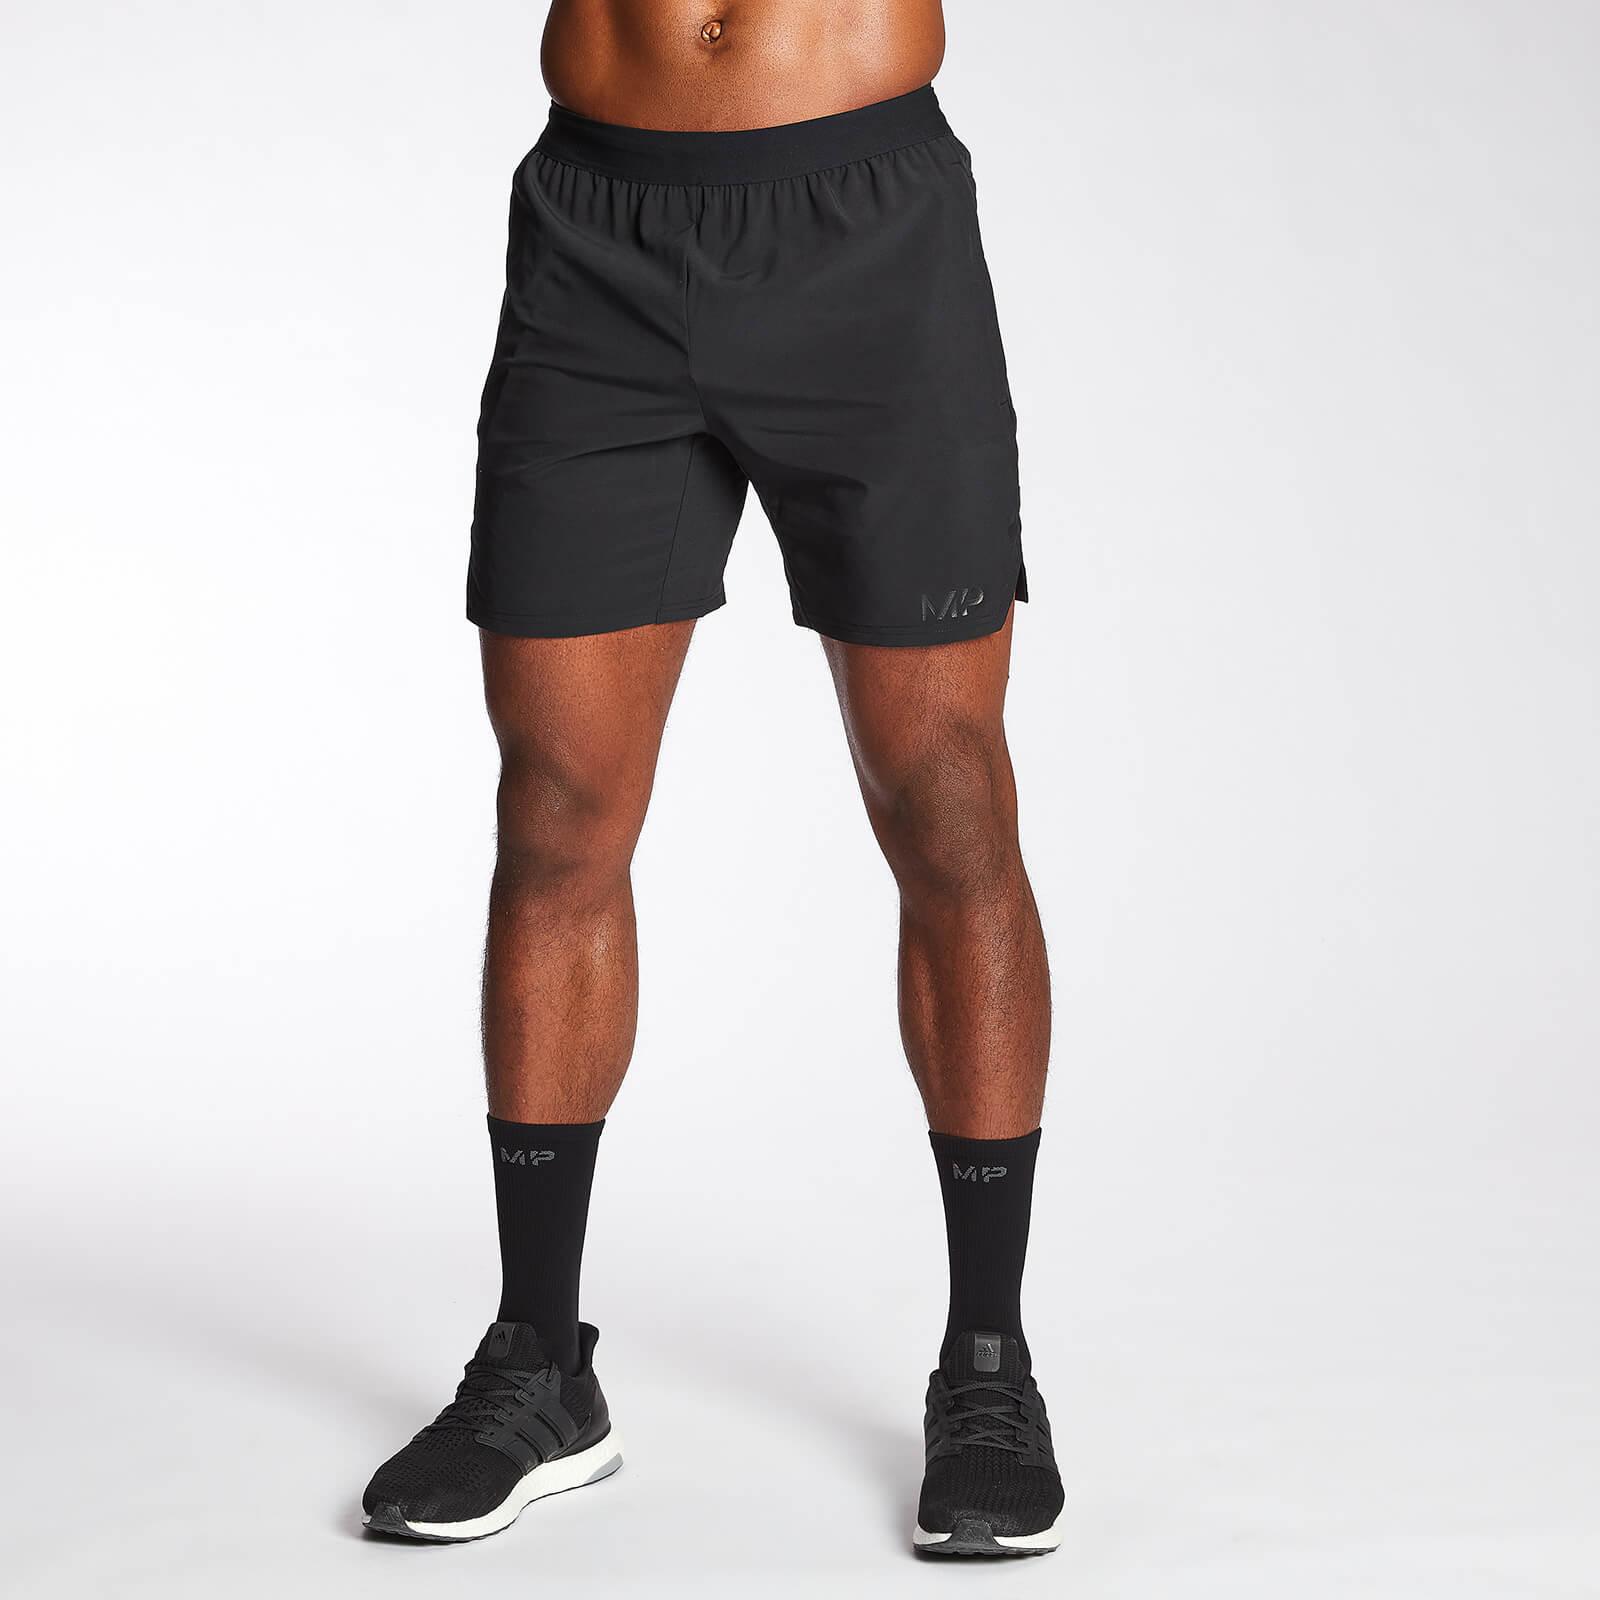 Купить MP Men's Agility Shorts - Black - XXS, Myprotein International